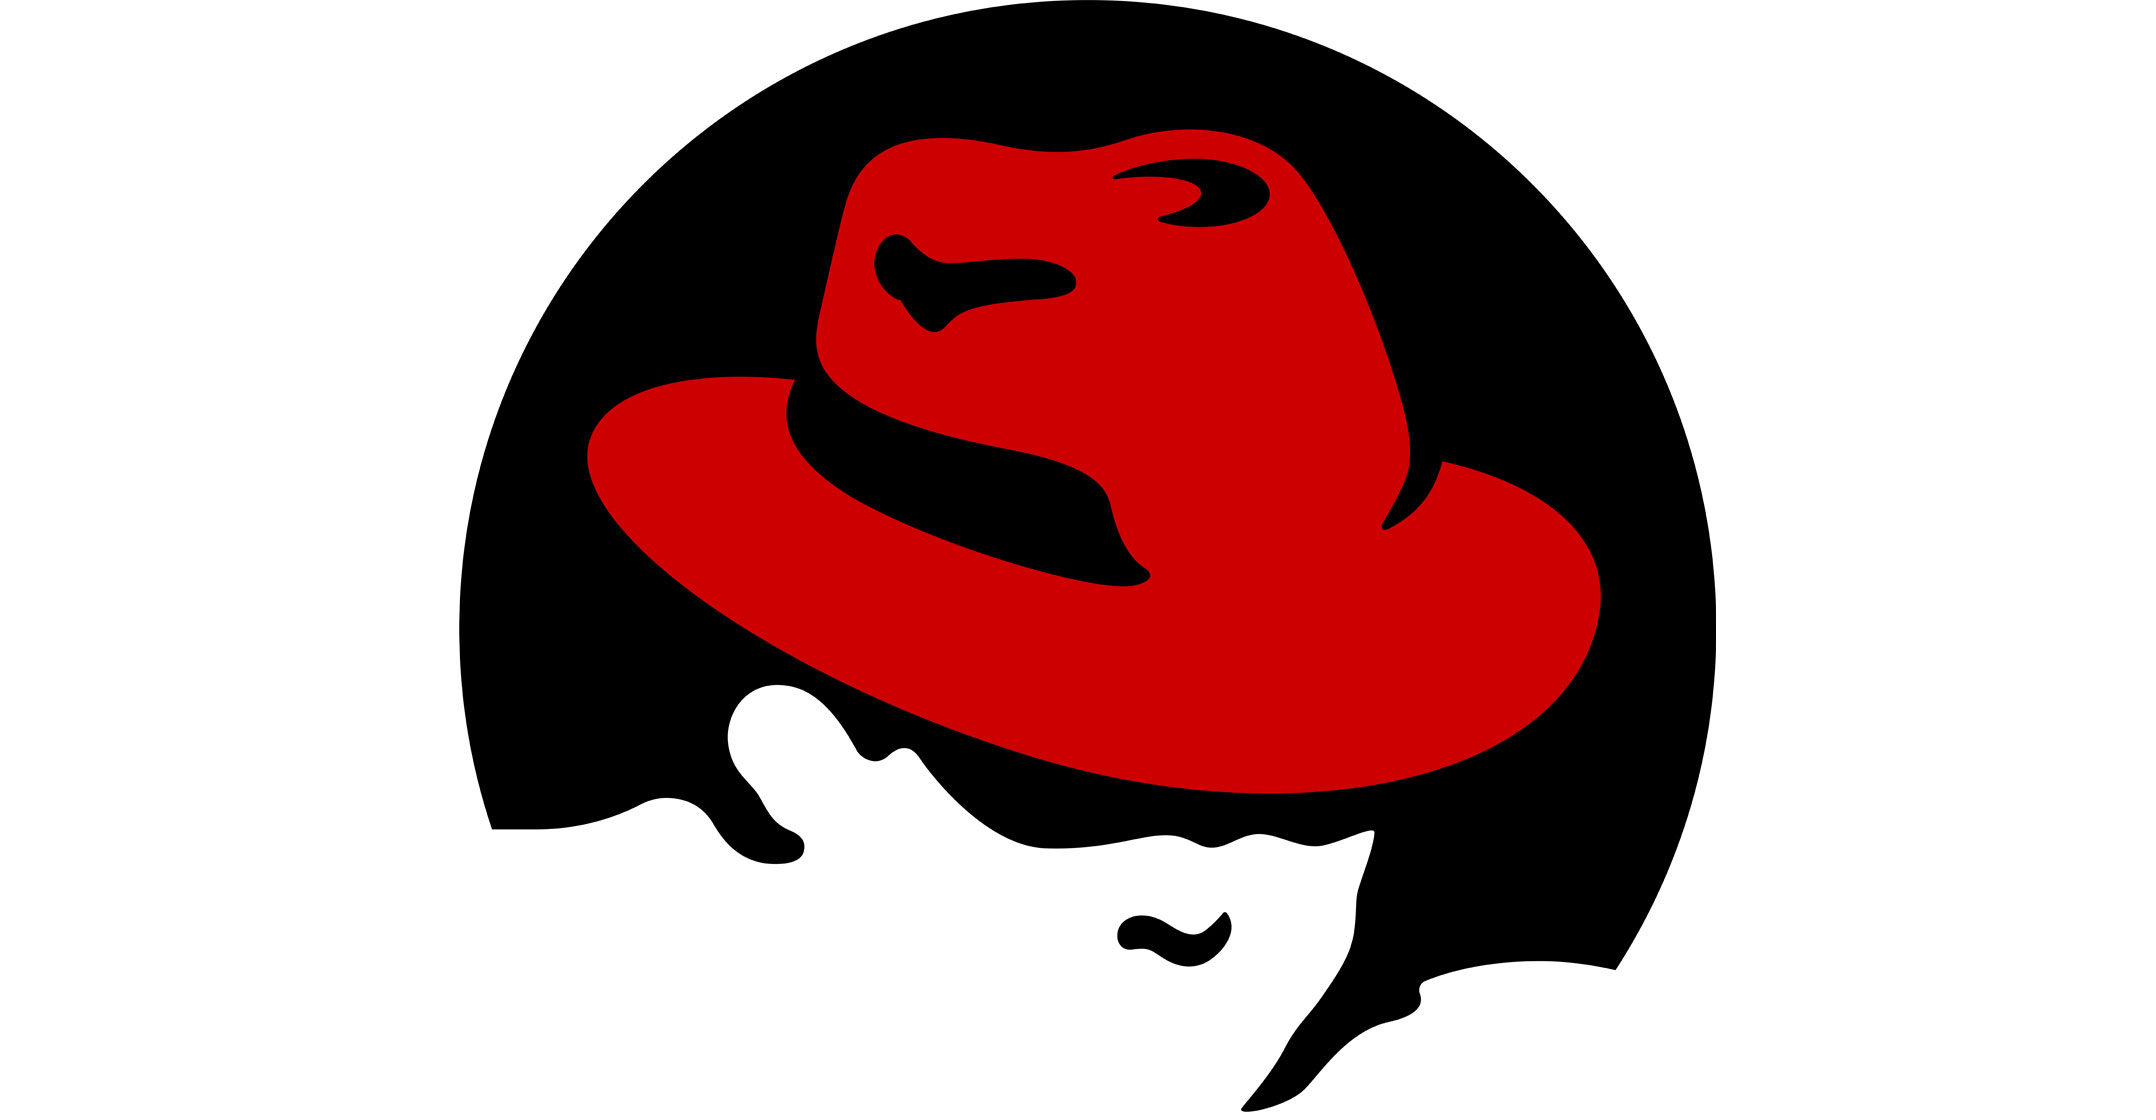 IBM agrees to buy Red Hat for $34 billion